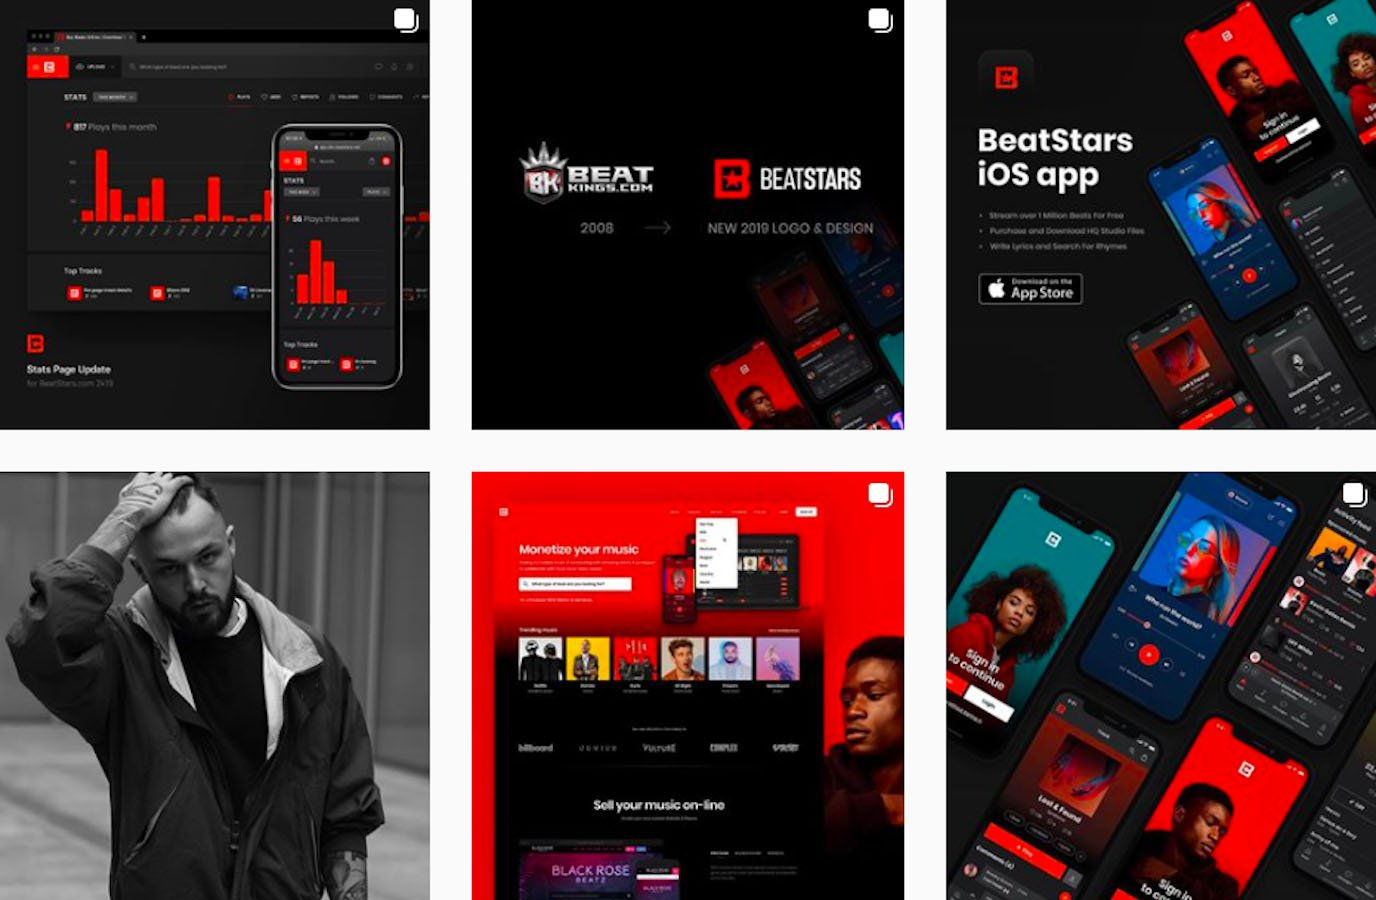 Web Design Inspiration: 110+ Accounts On Instagram and 10+ Best UX & Web Design Books in 2020 - dsgnr